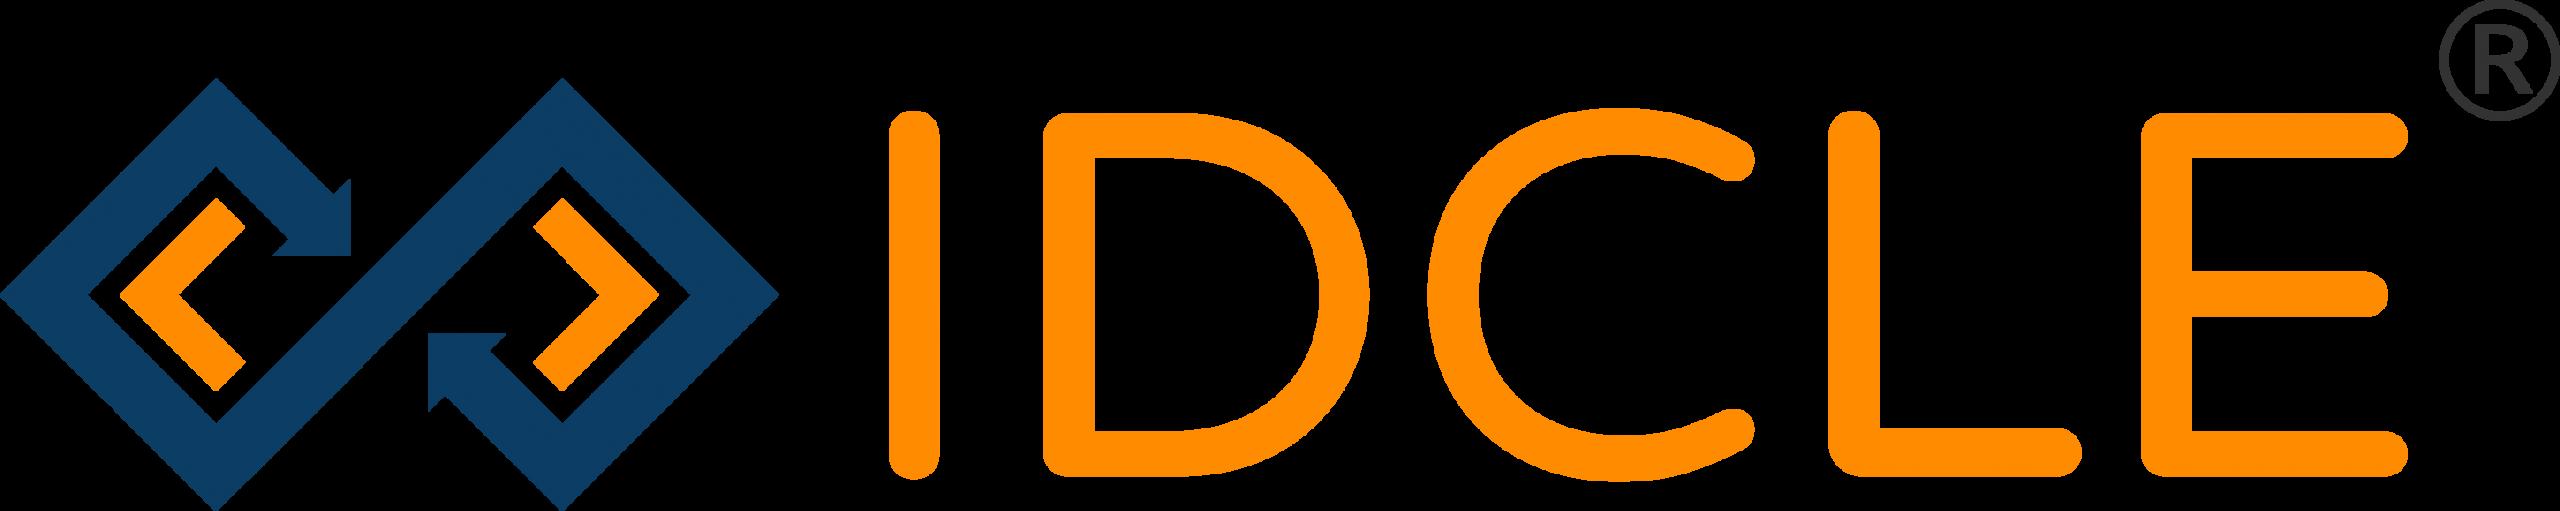 IDCLE